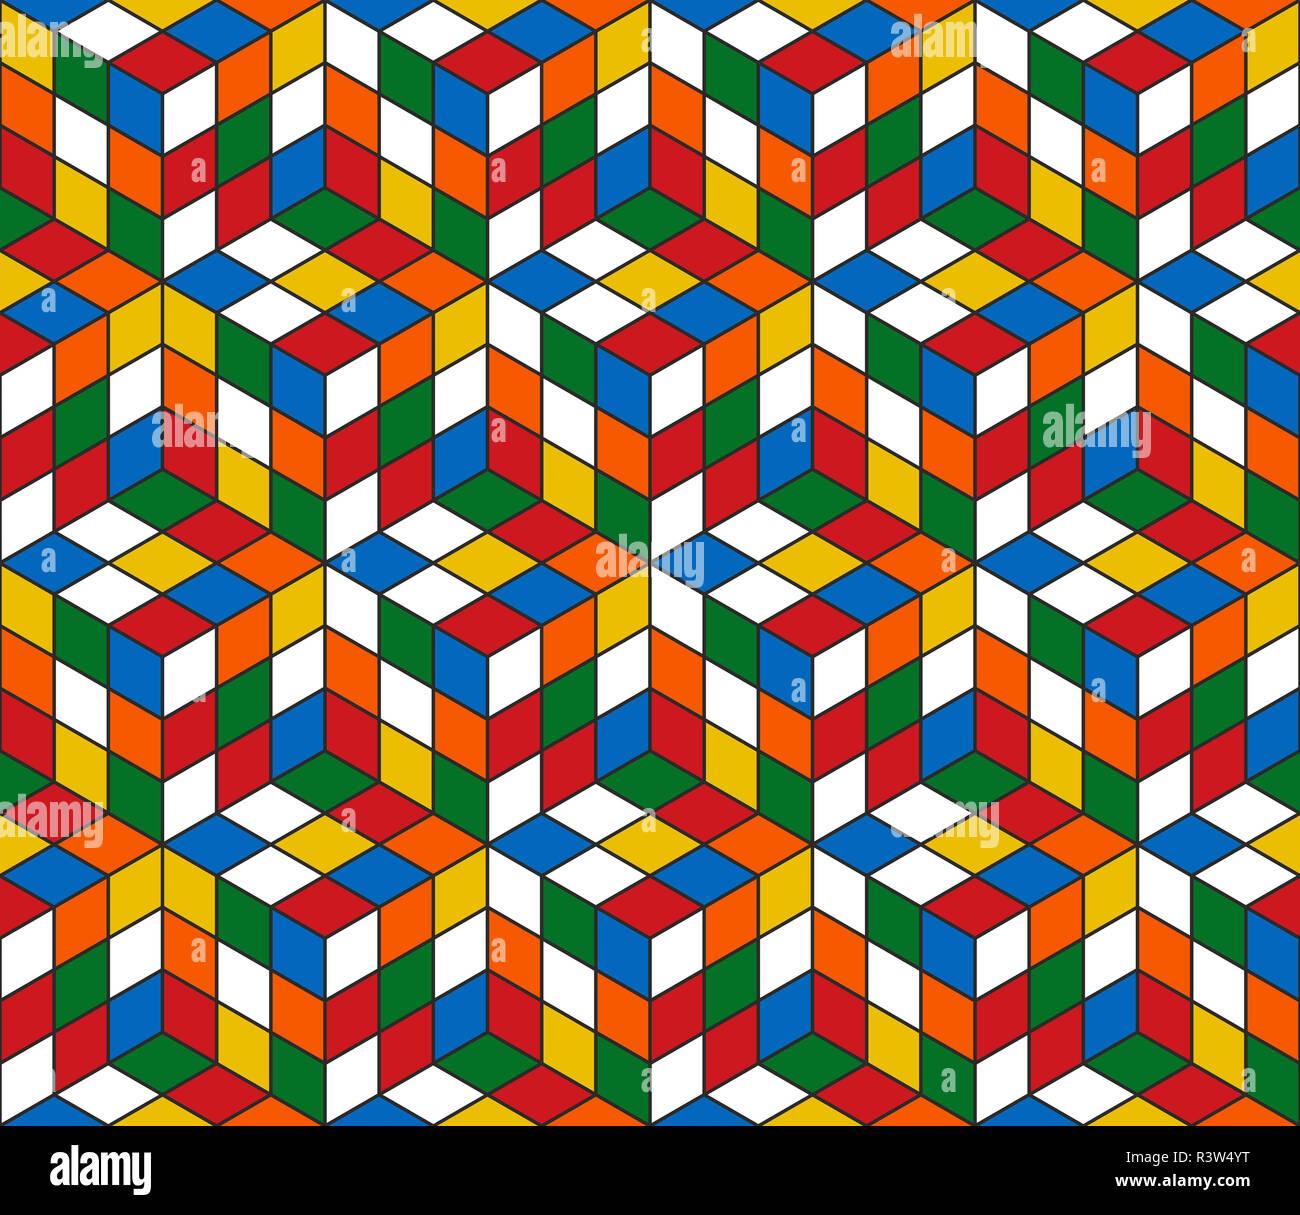 magic cube retro 80s pattern background R3W4YT